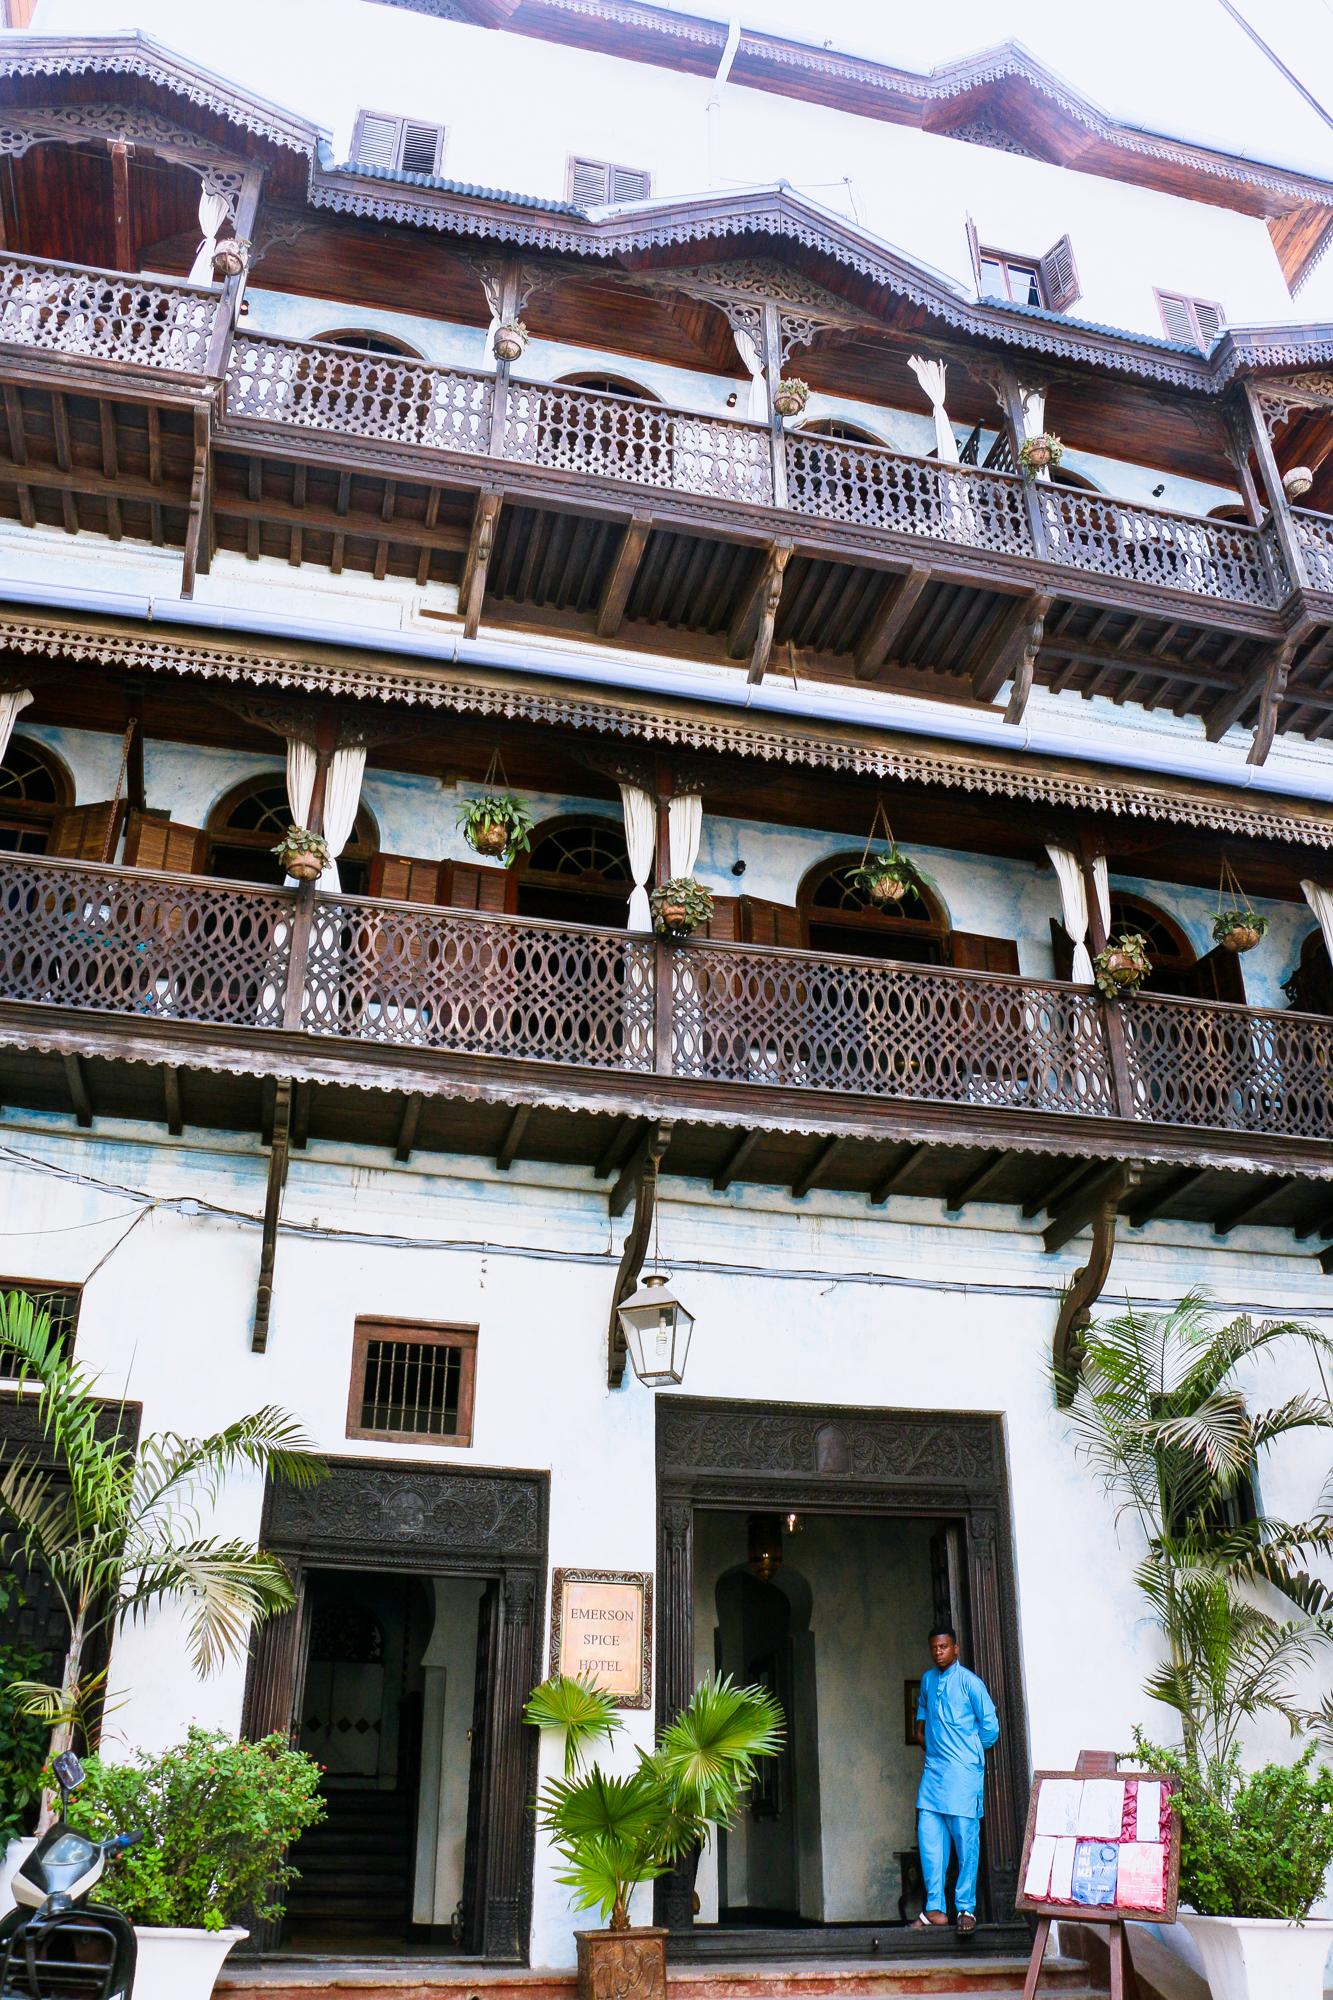 Emerson Spice Hotel Stone Town Zanzibar